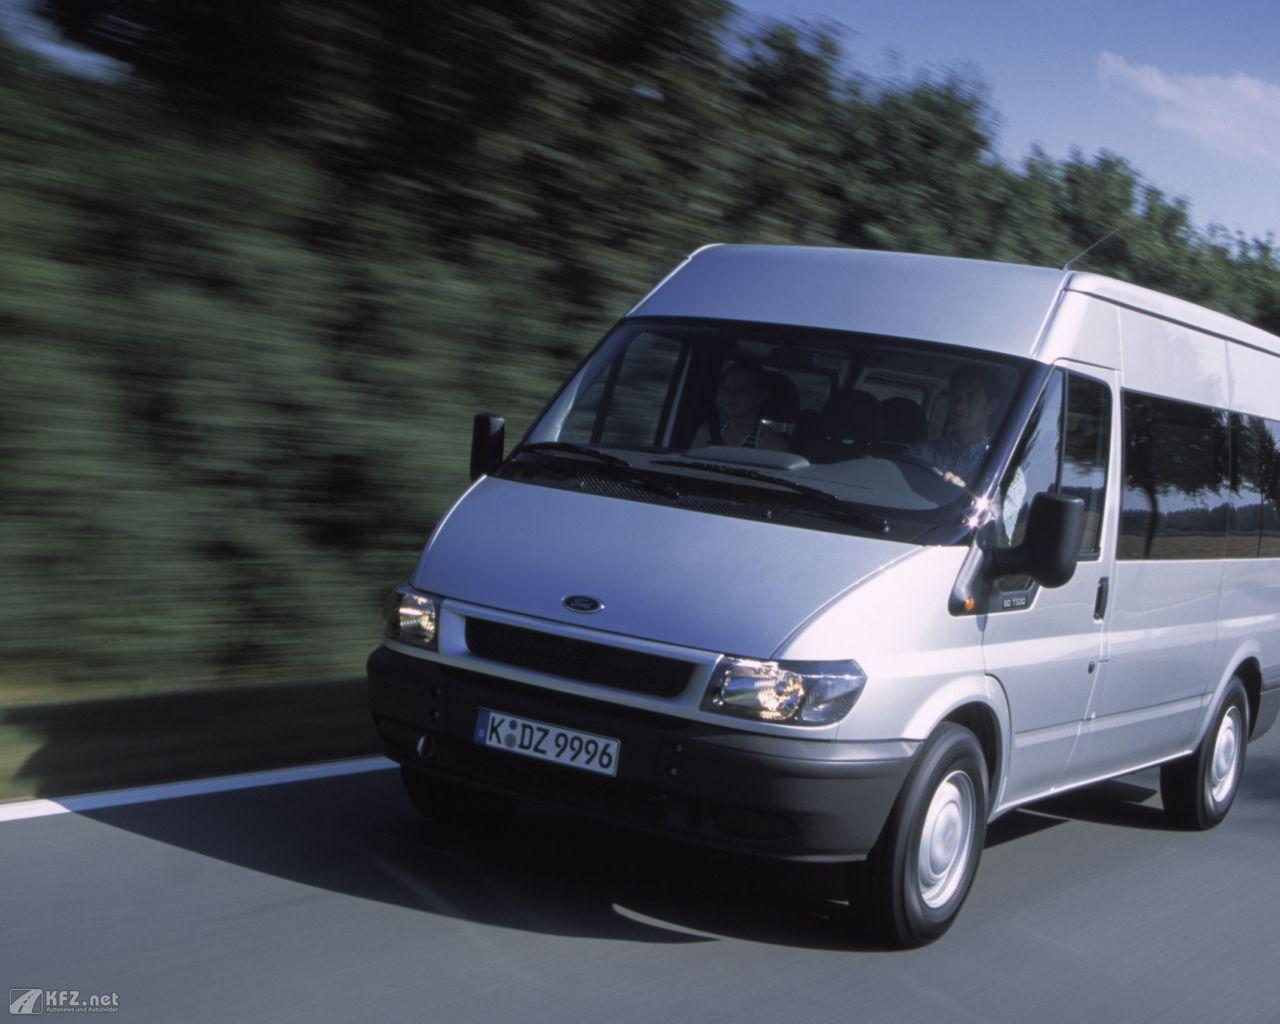 ford-transit-1280x1024-9